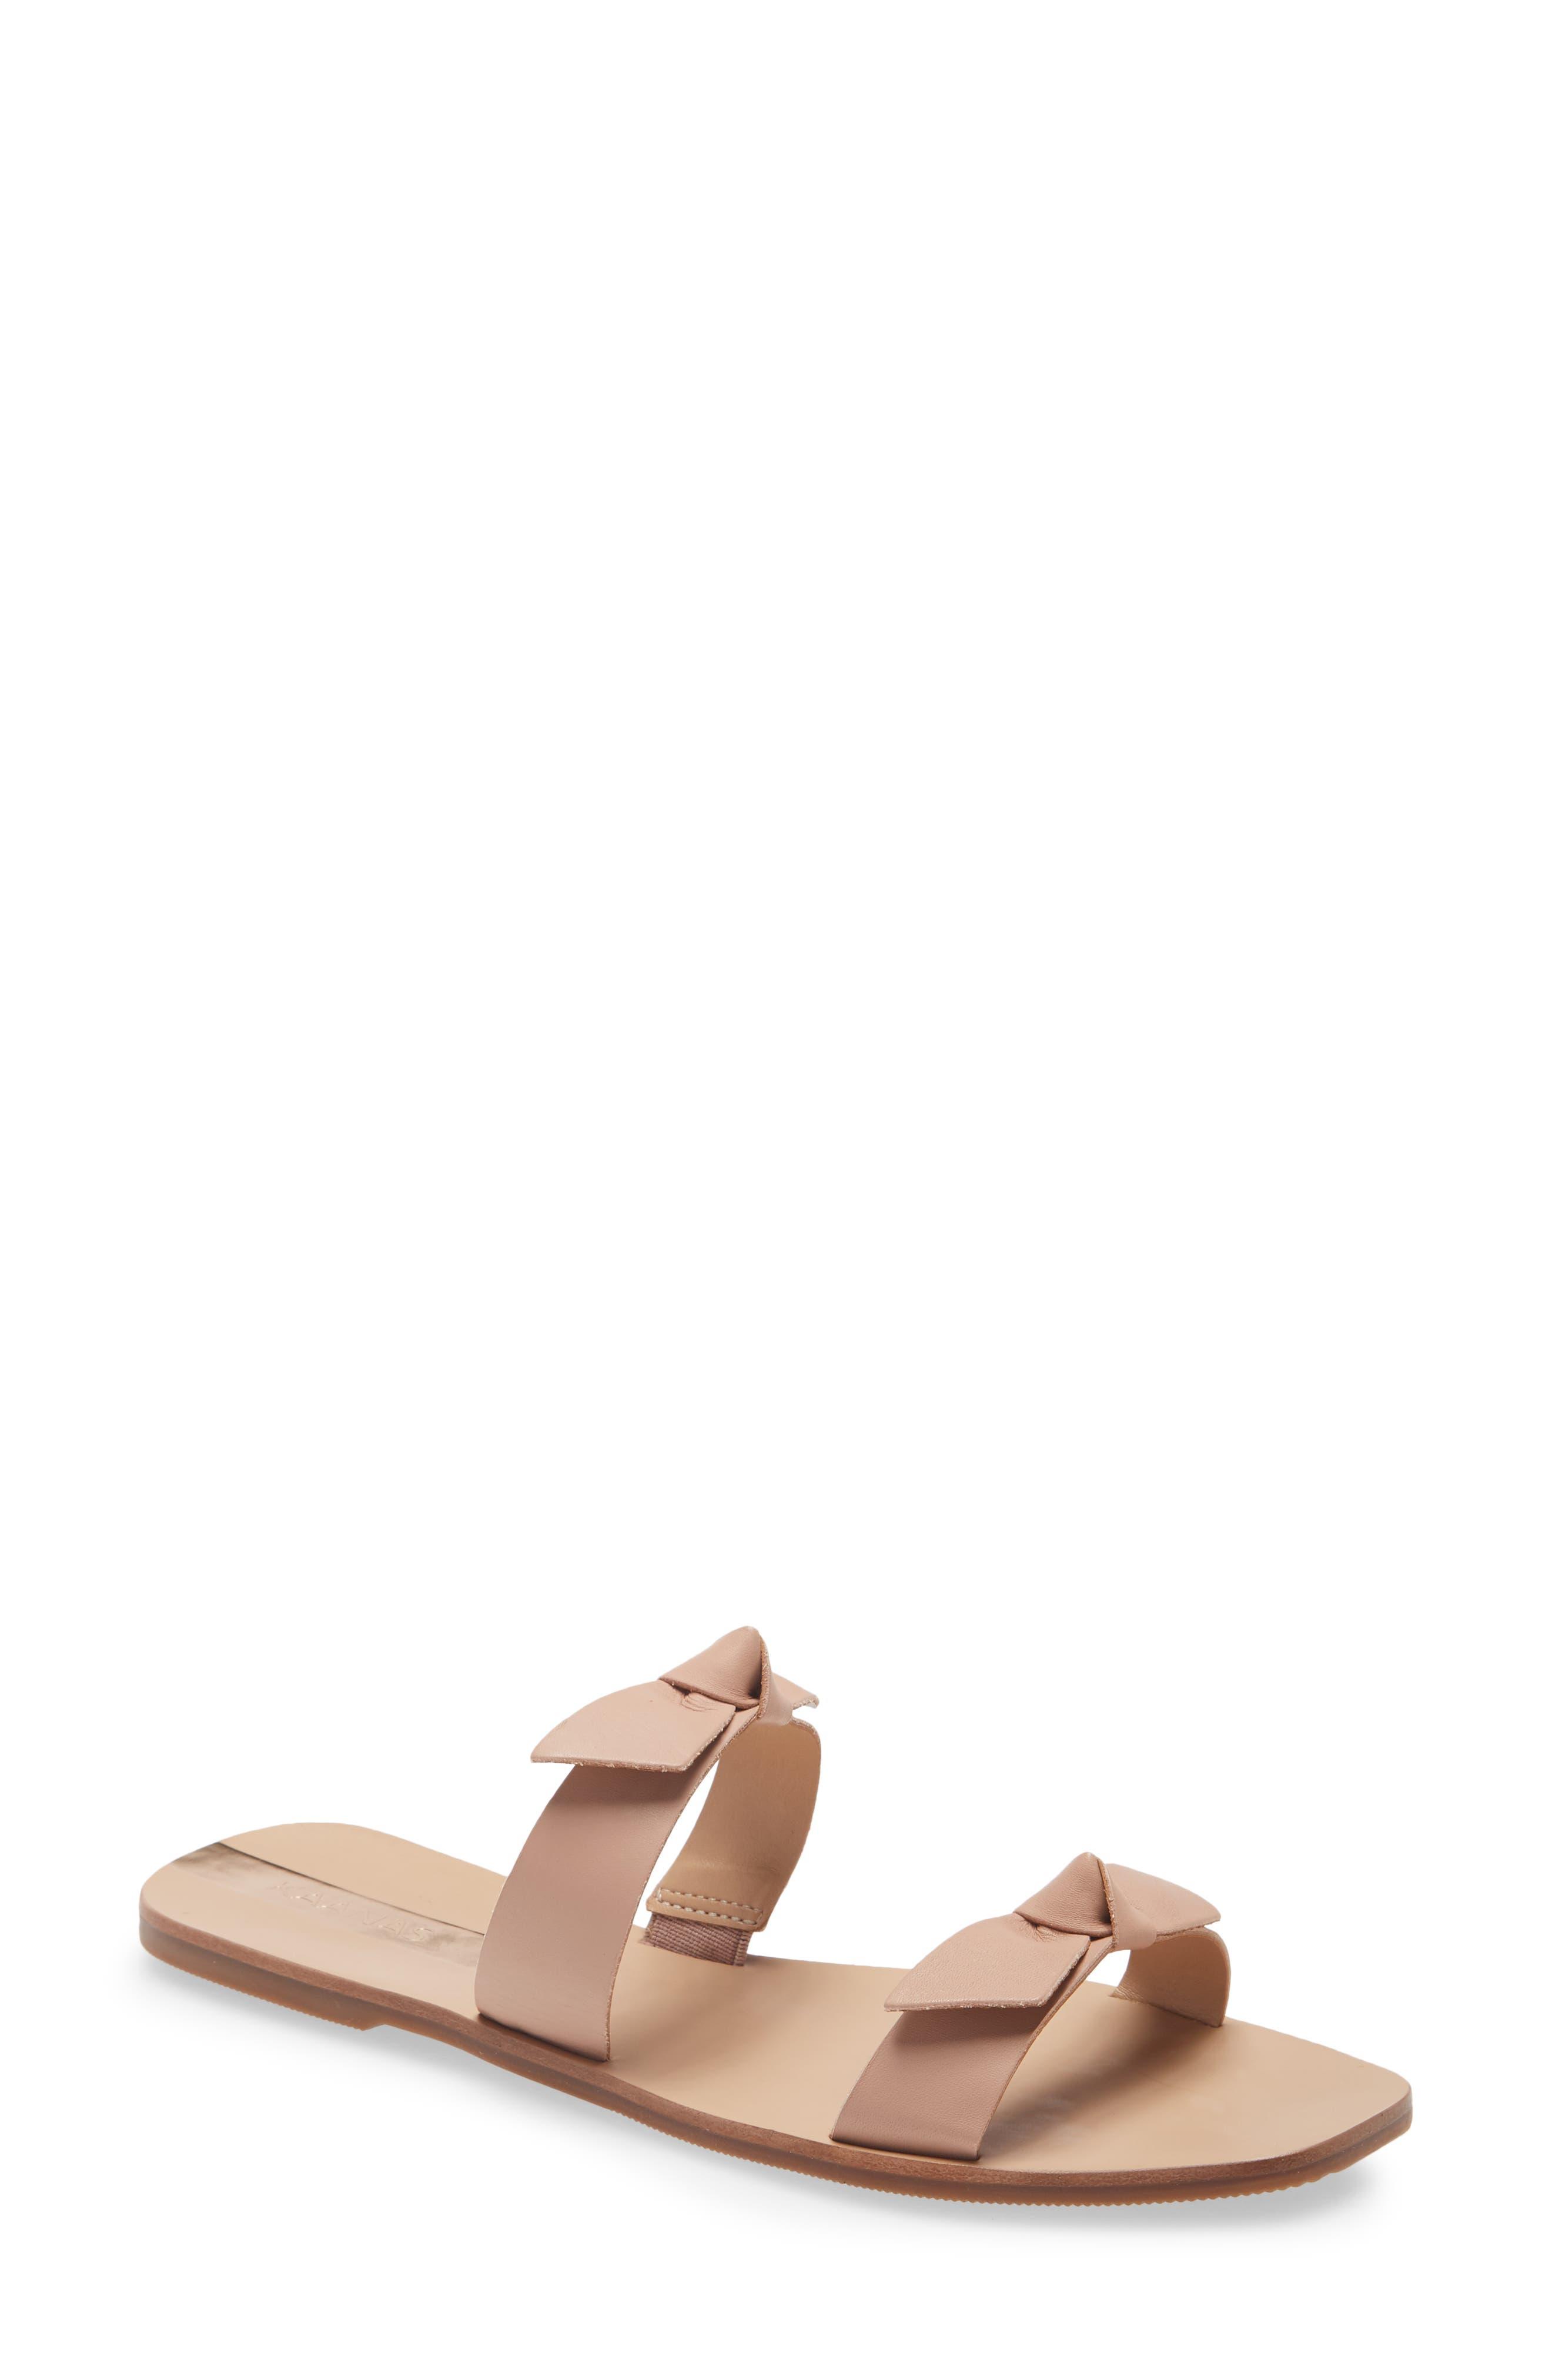 Antonia Double Bow Slide Sandal